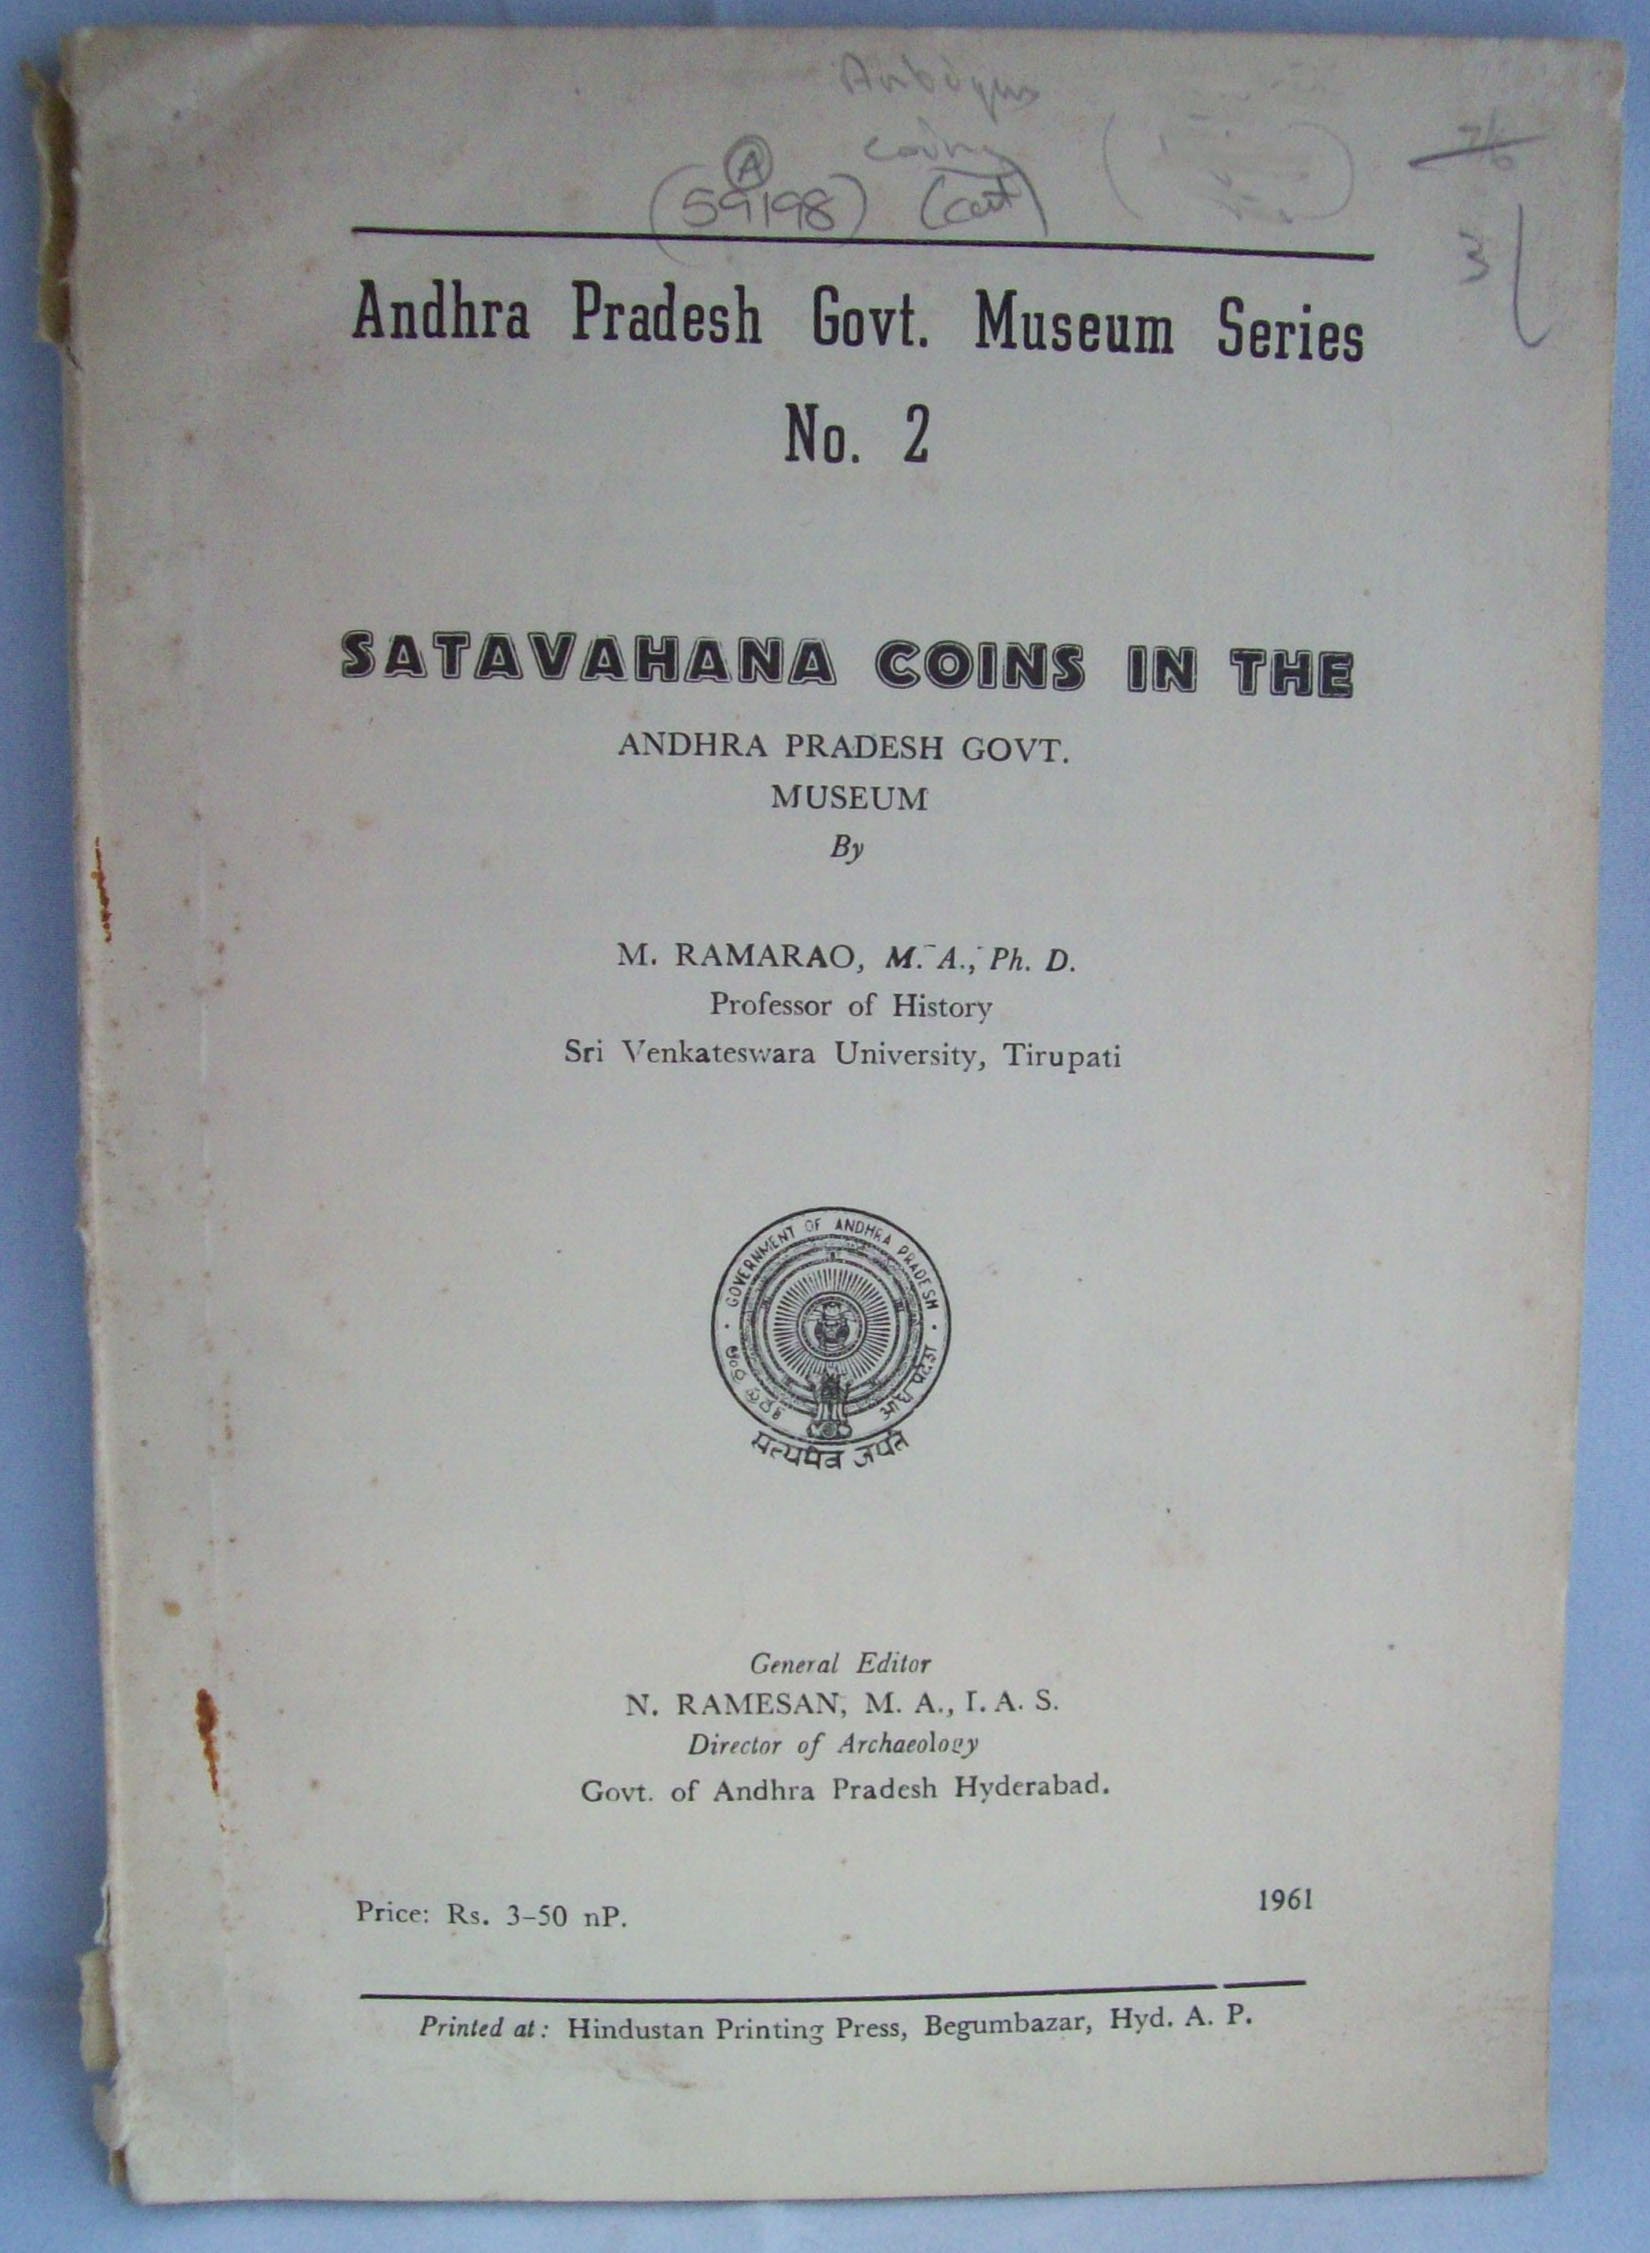 Satavahana coins in the Andhra Pradesh Govt  Museum (Andhra